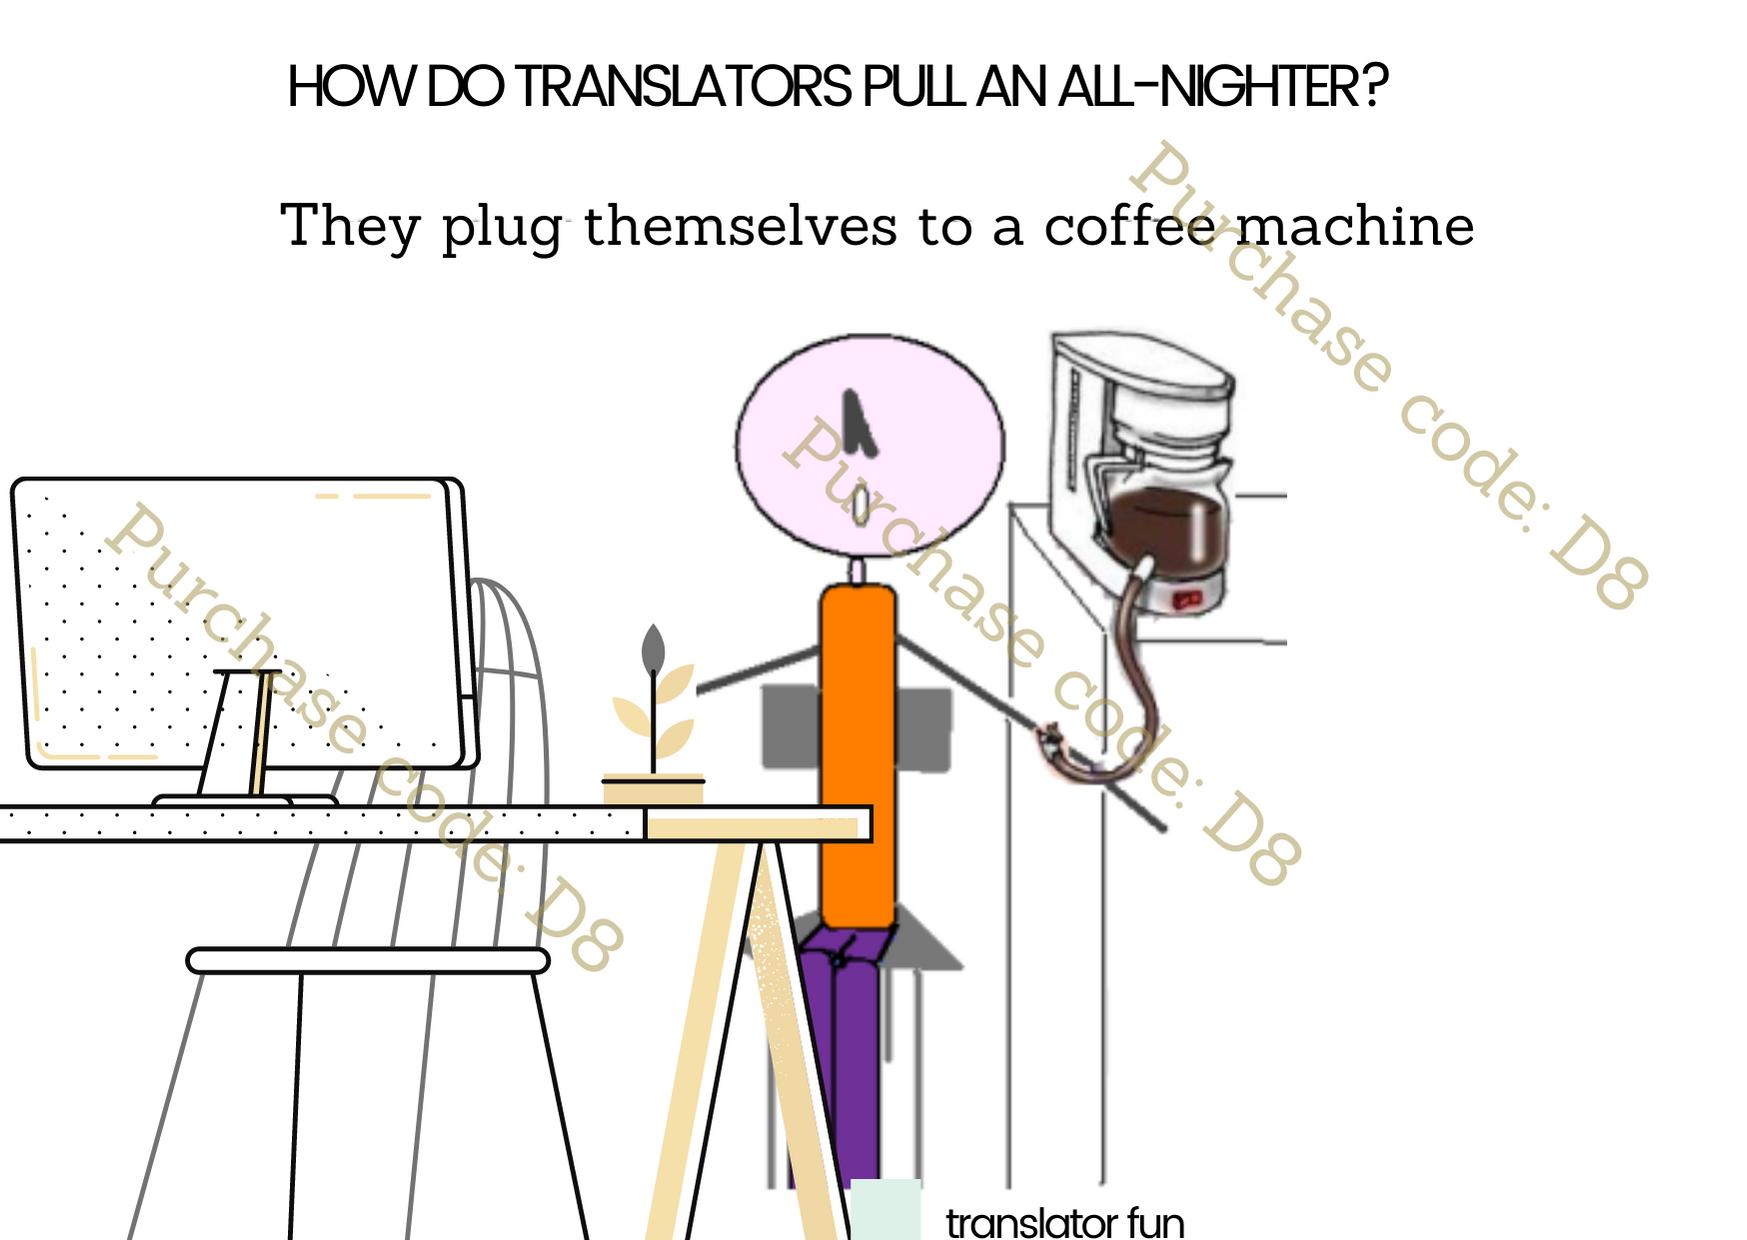 A translator pulls an all-nighter